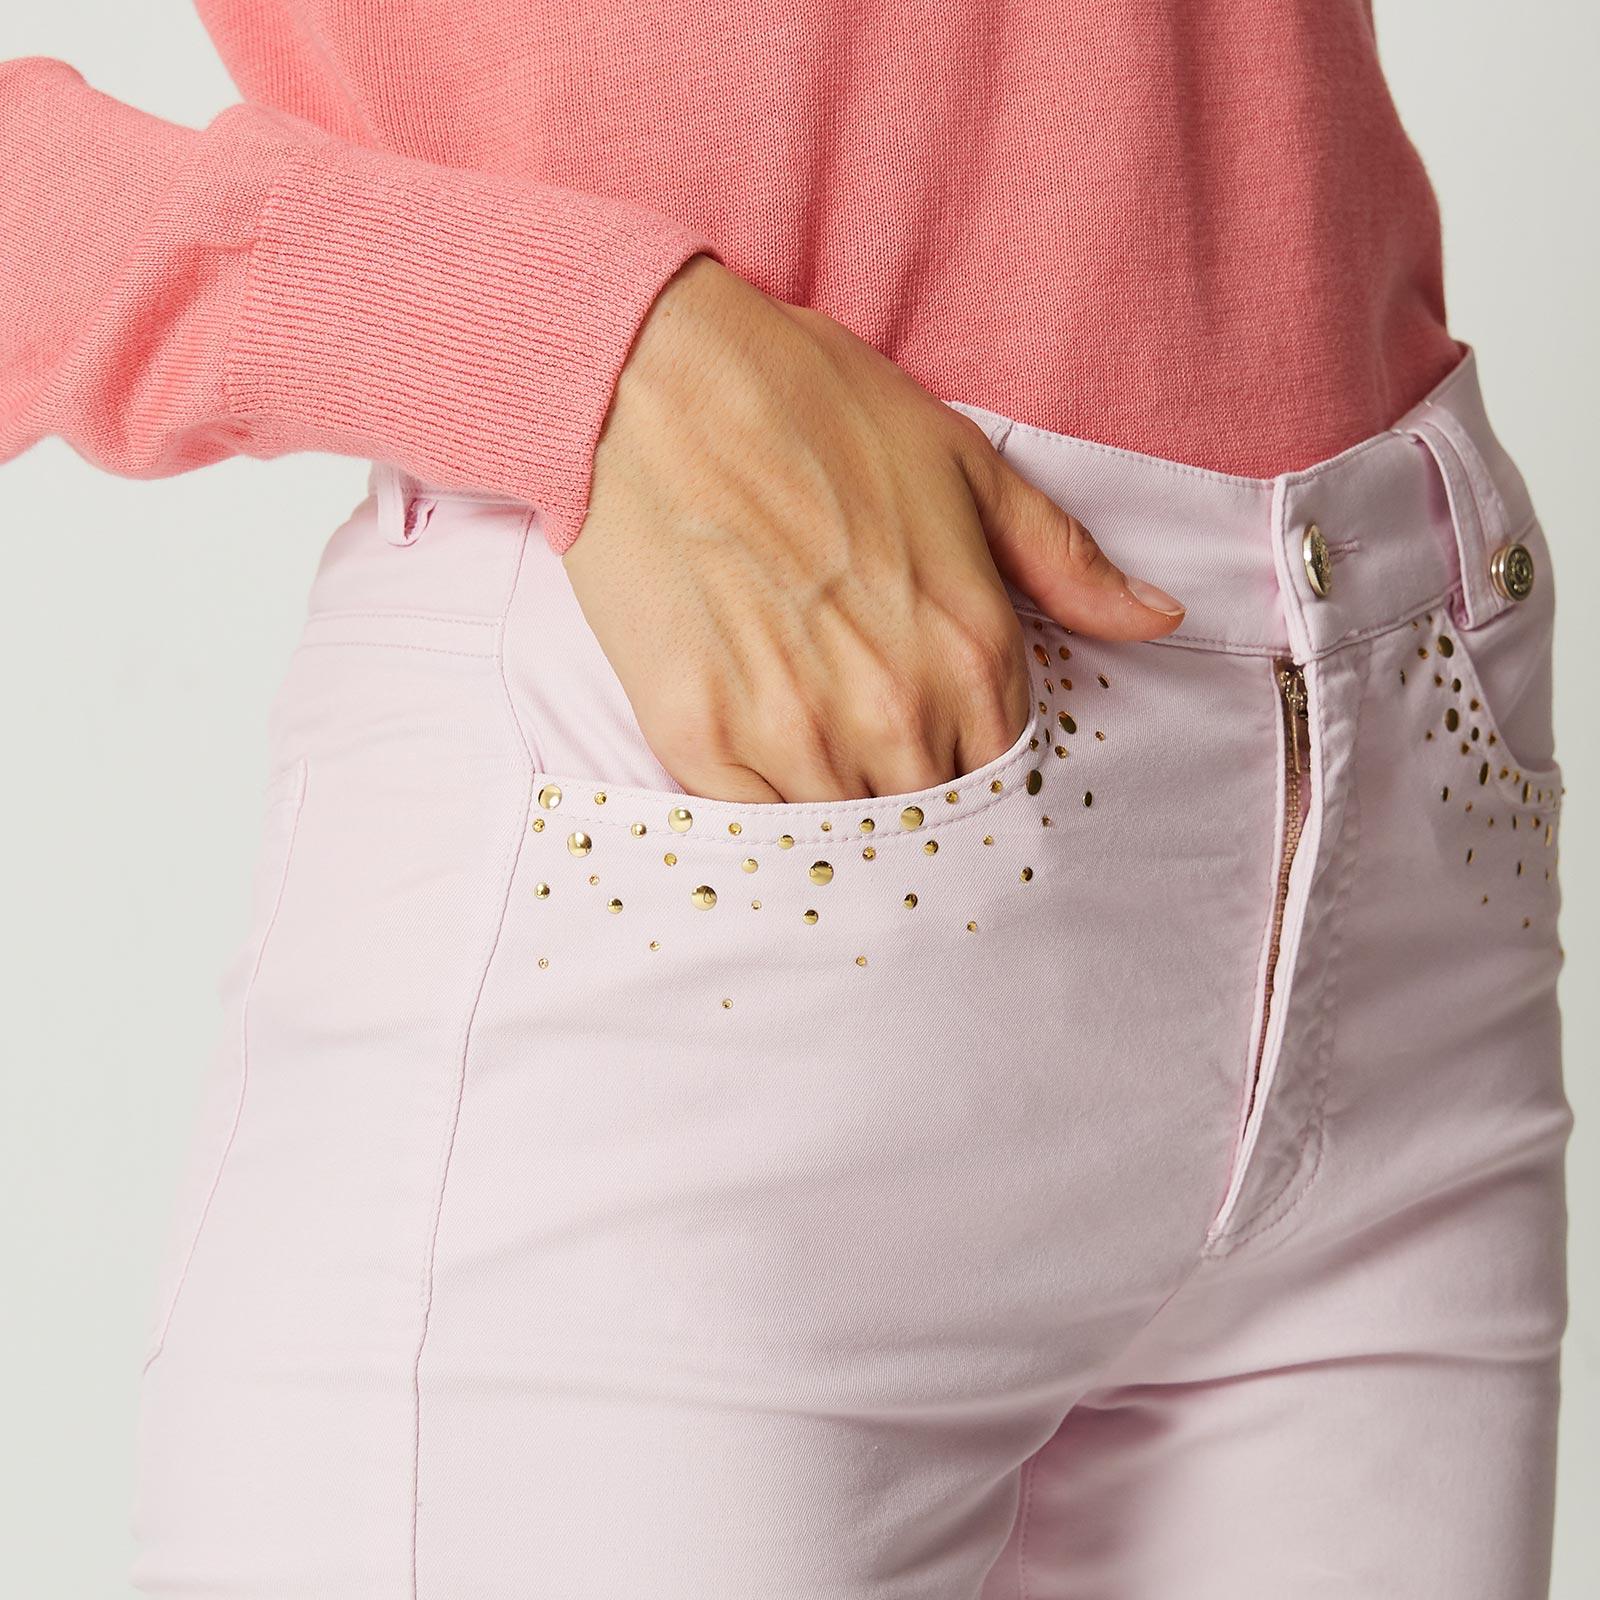 Damen Hose im Denimstyle